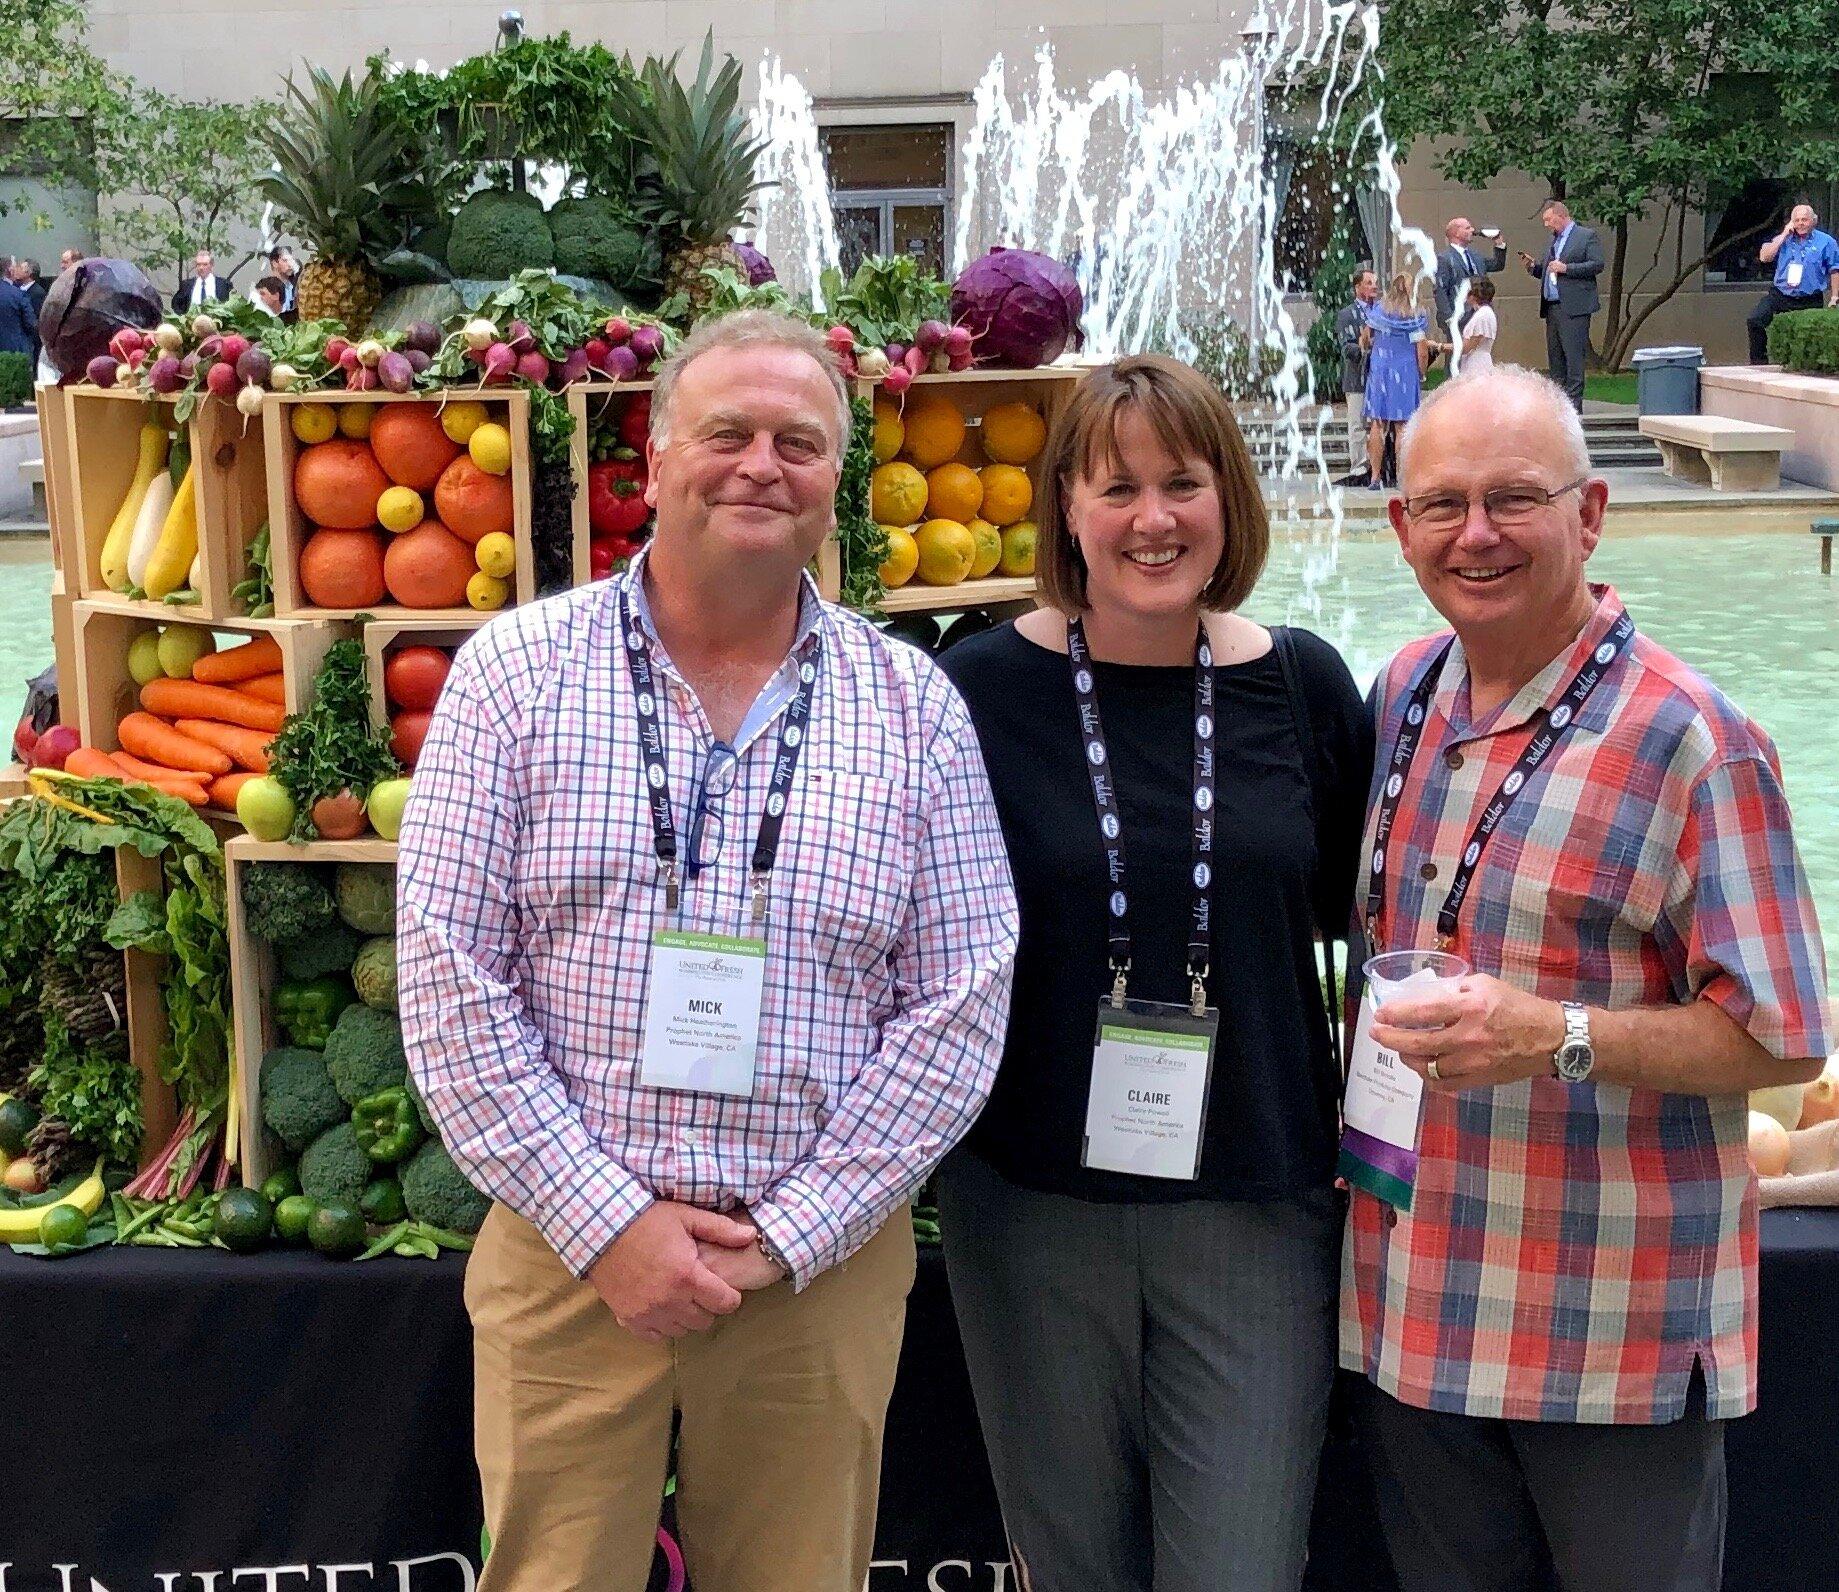 Mick Heatherington, Claire Powell and Bill Brooks – CEO - Westlake Produce Company